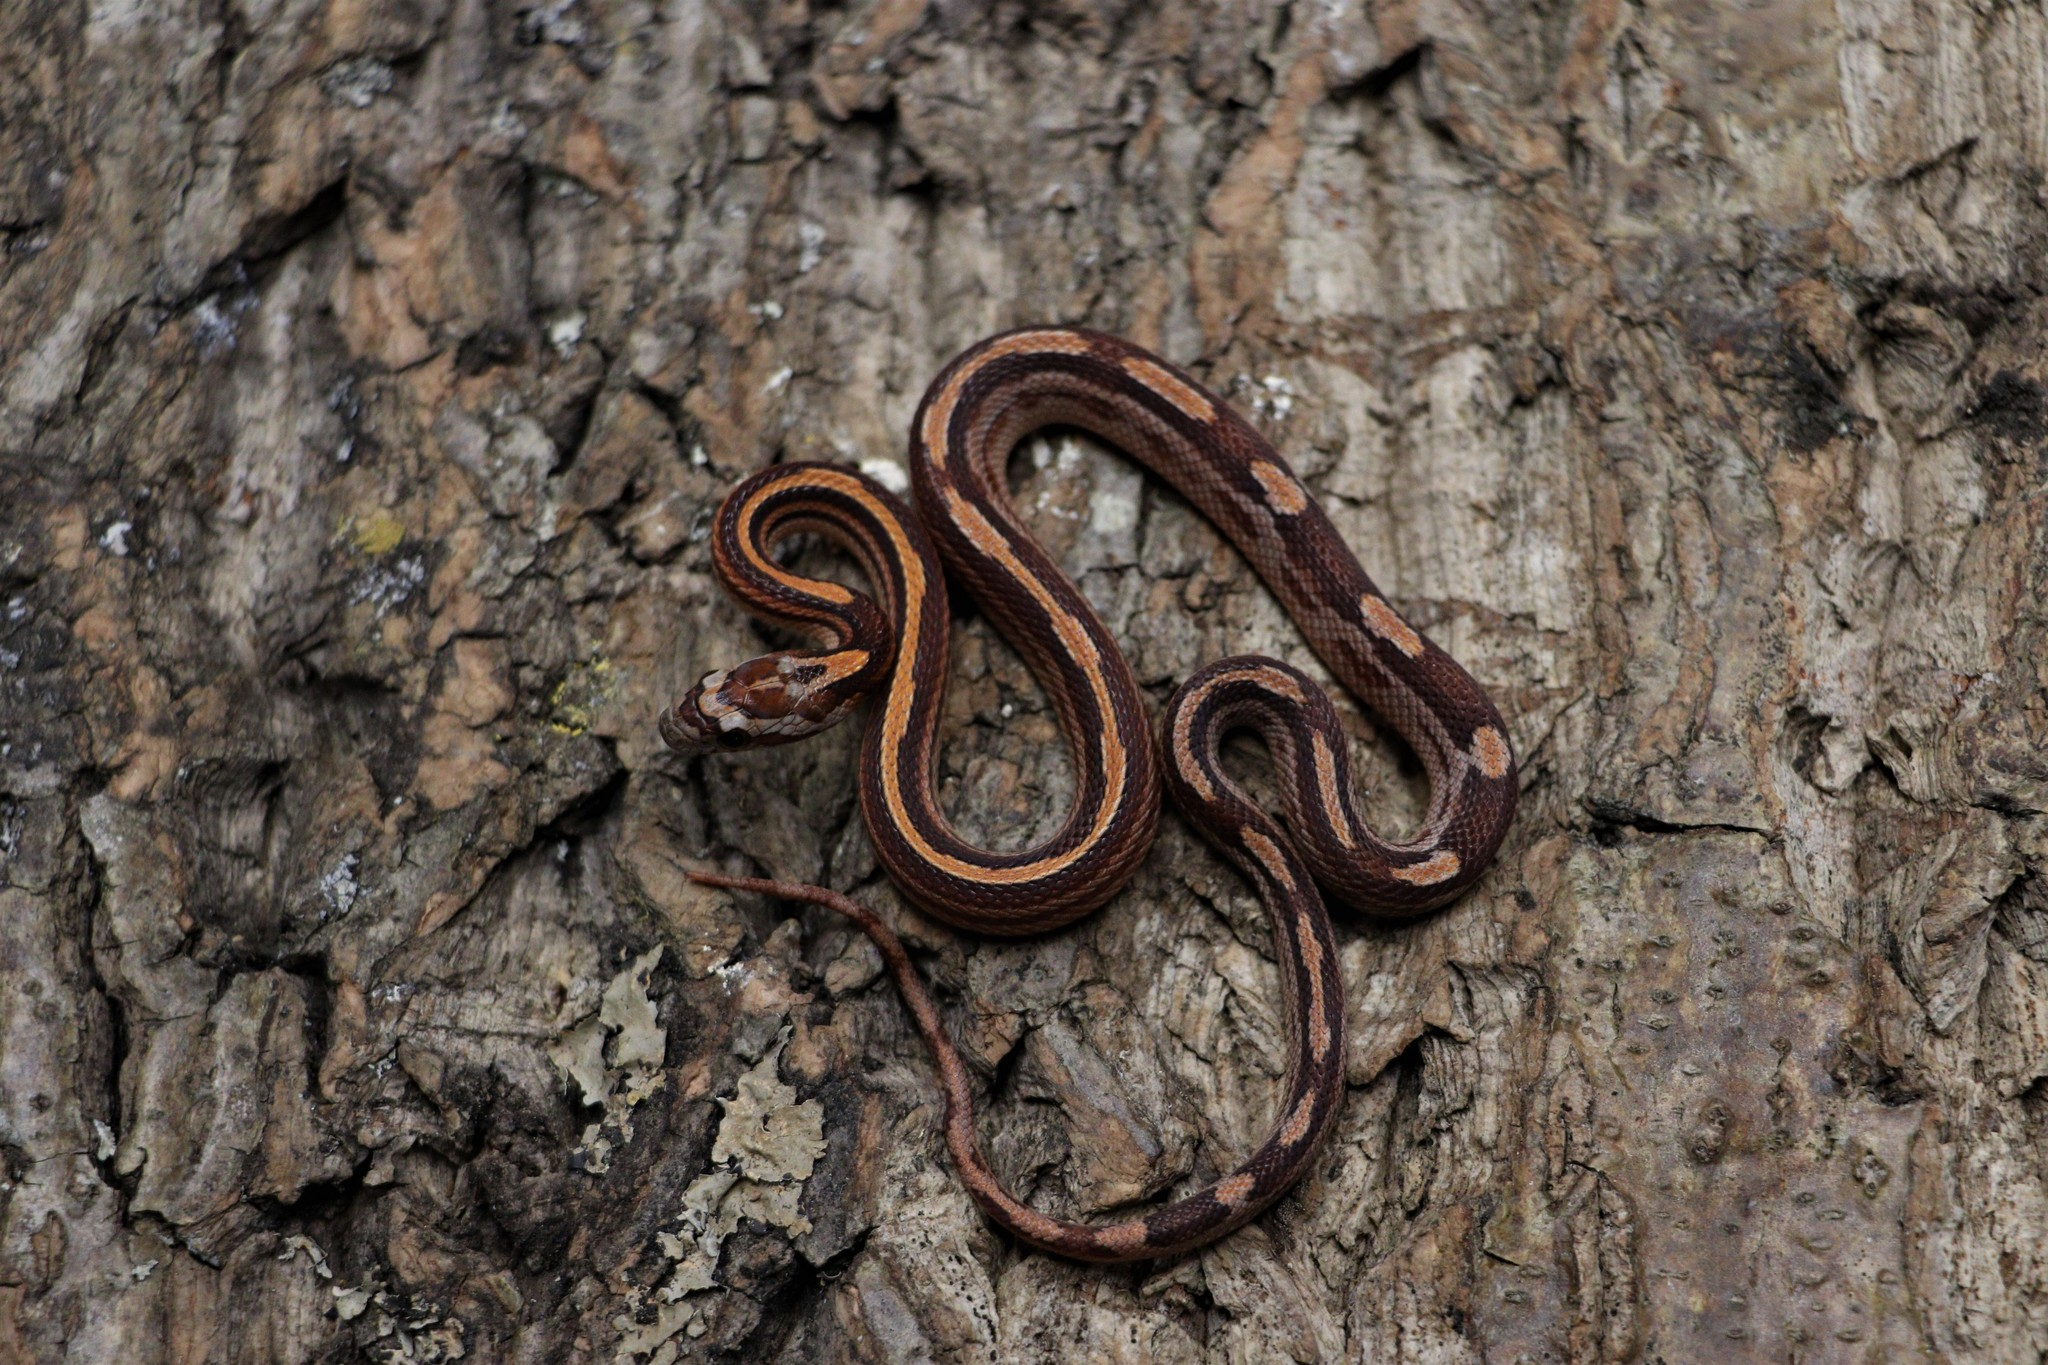 Motley Stripe Corn Snake